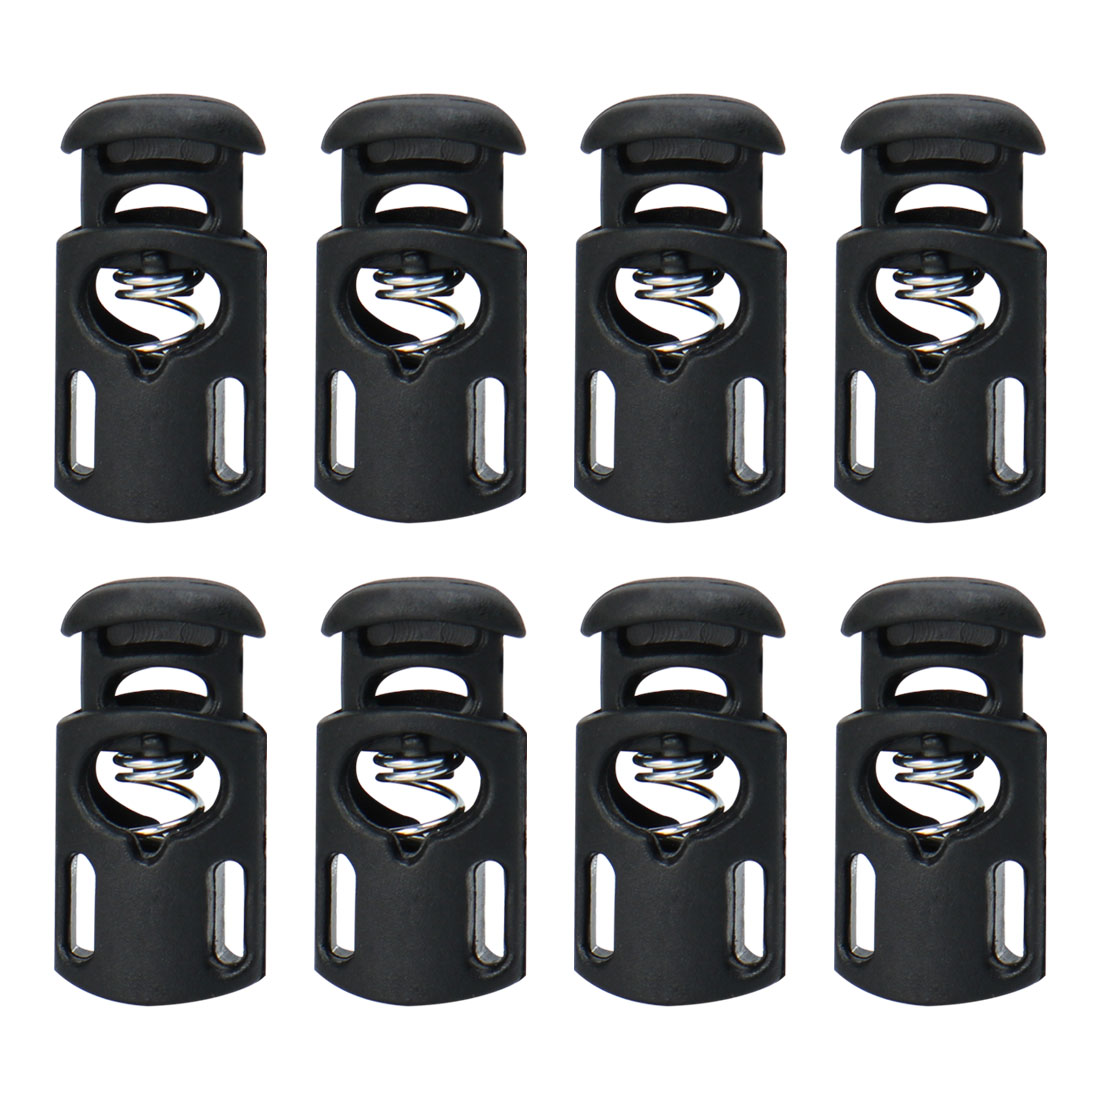 8pcs Plastic Cord Lock Stopper Spring Toggle Fastener Slider Organizer Black